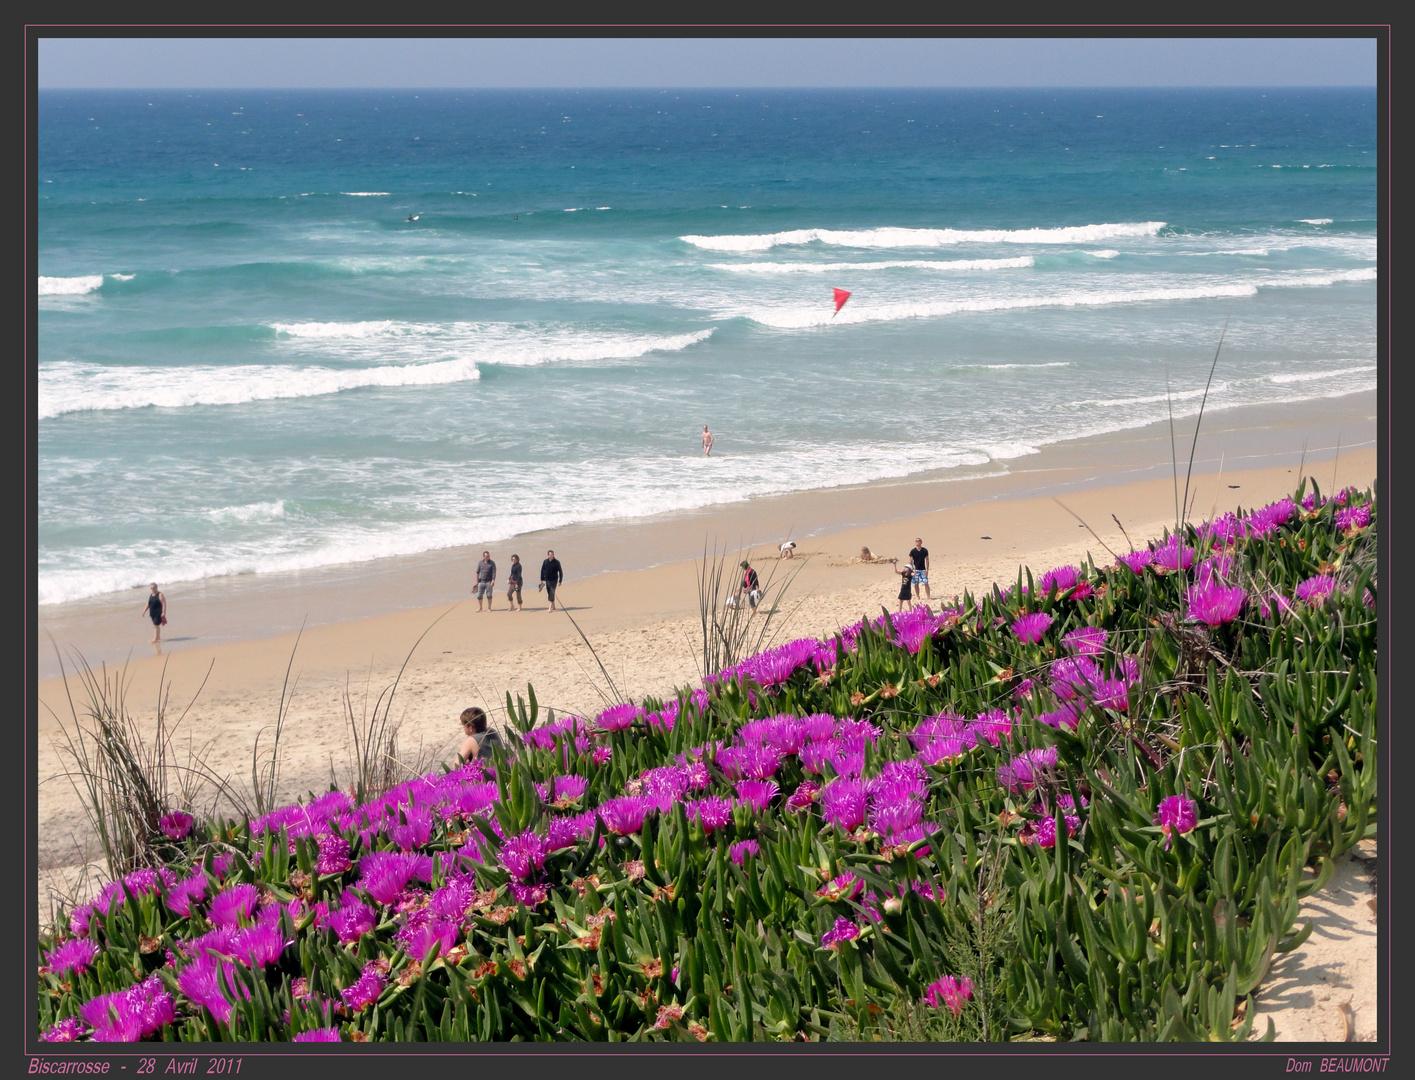 La plage au printemps